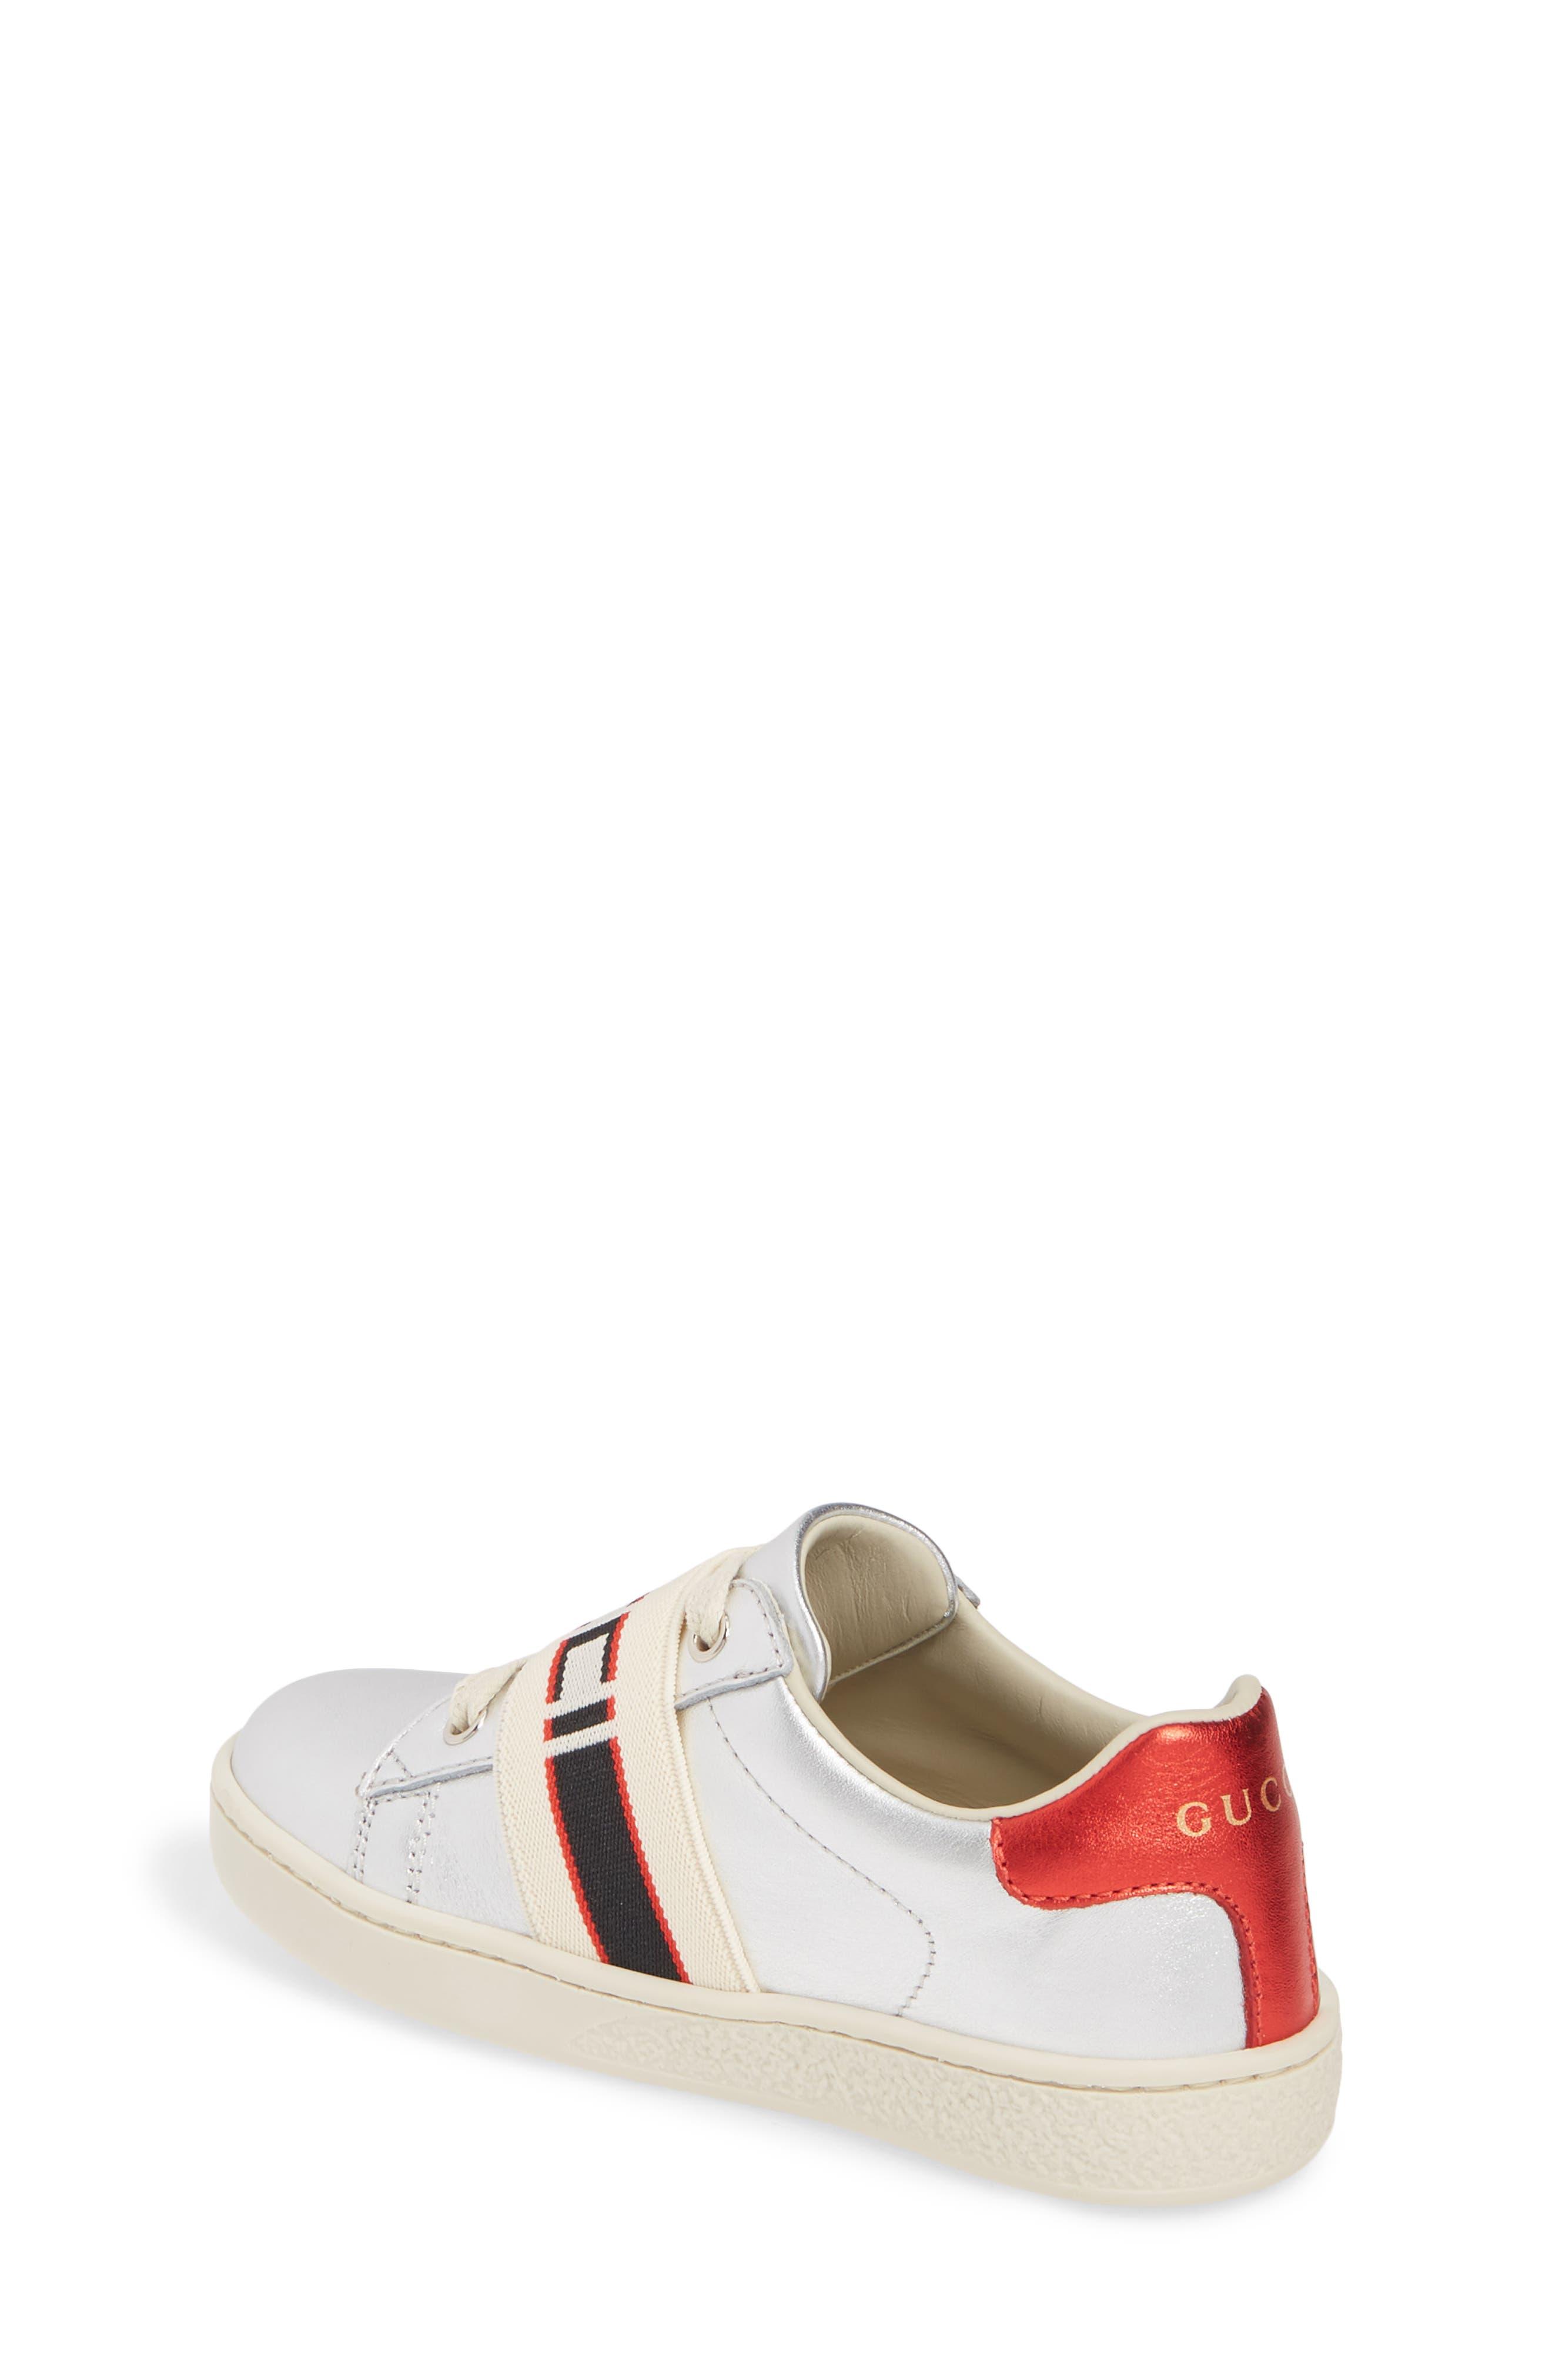 GUCCI, New Ace Stripe Sneaker, Alternate thumbnail 2, color, SILVER